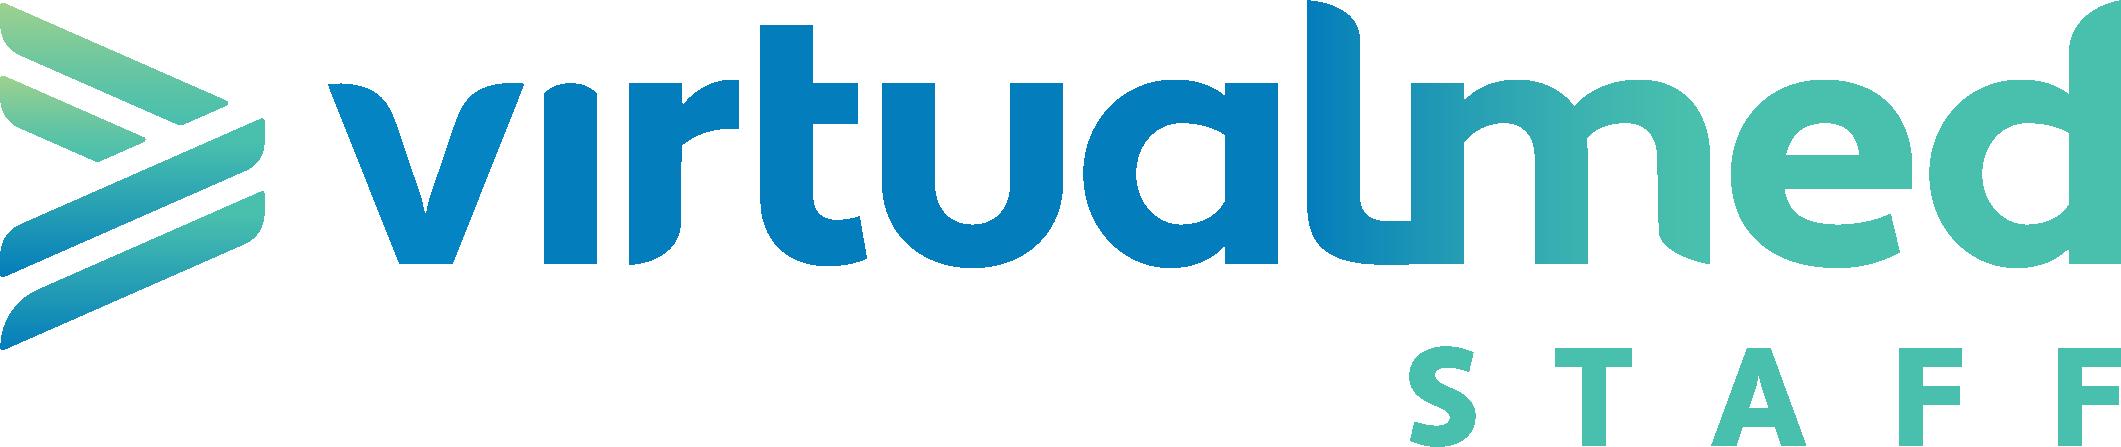 virtualmed staff logo